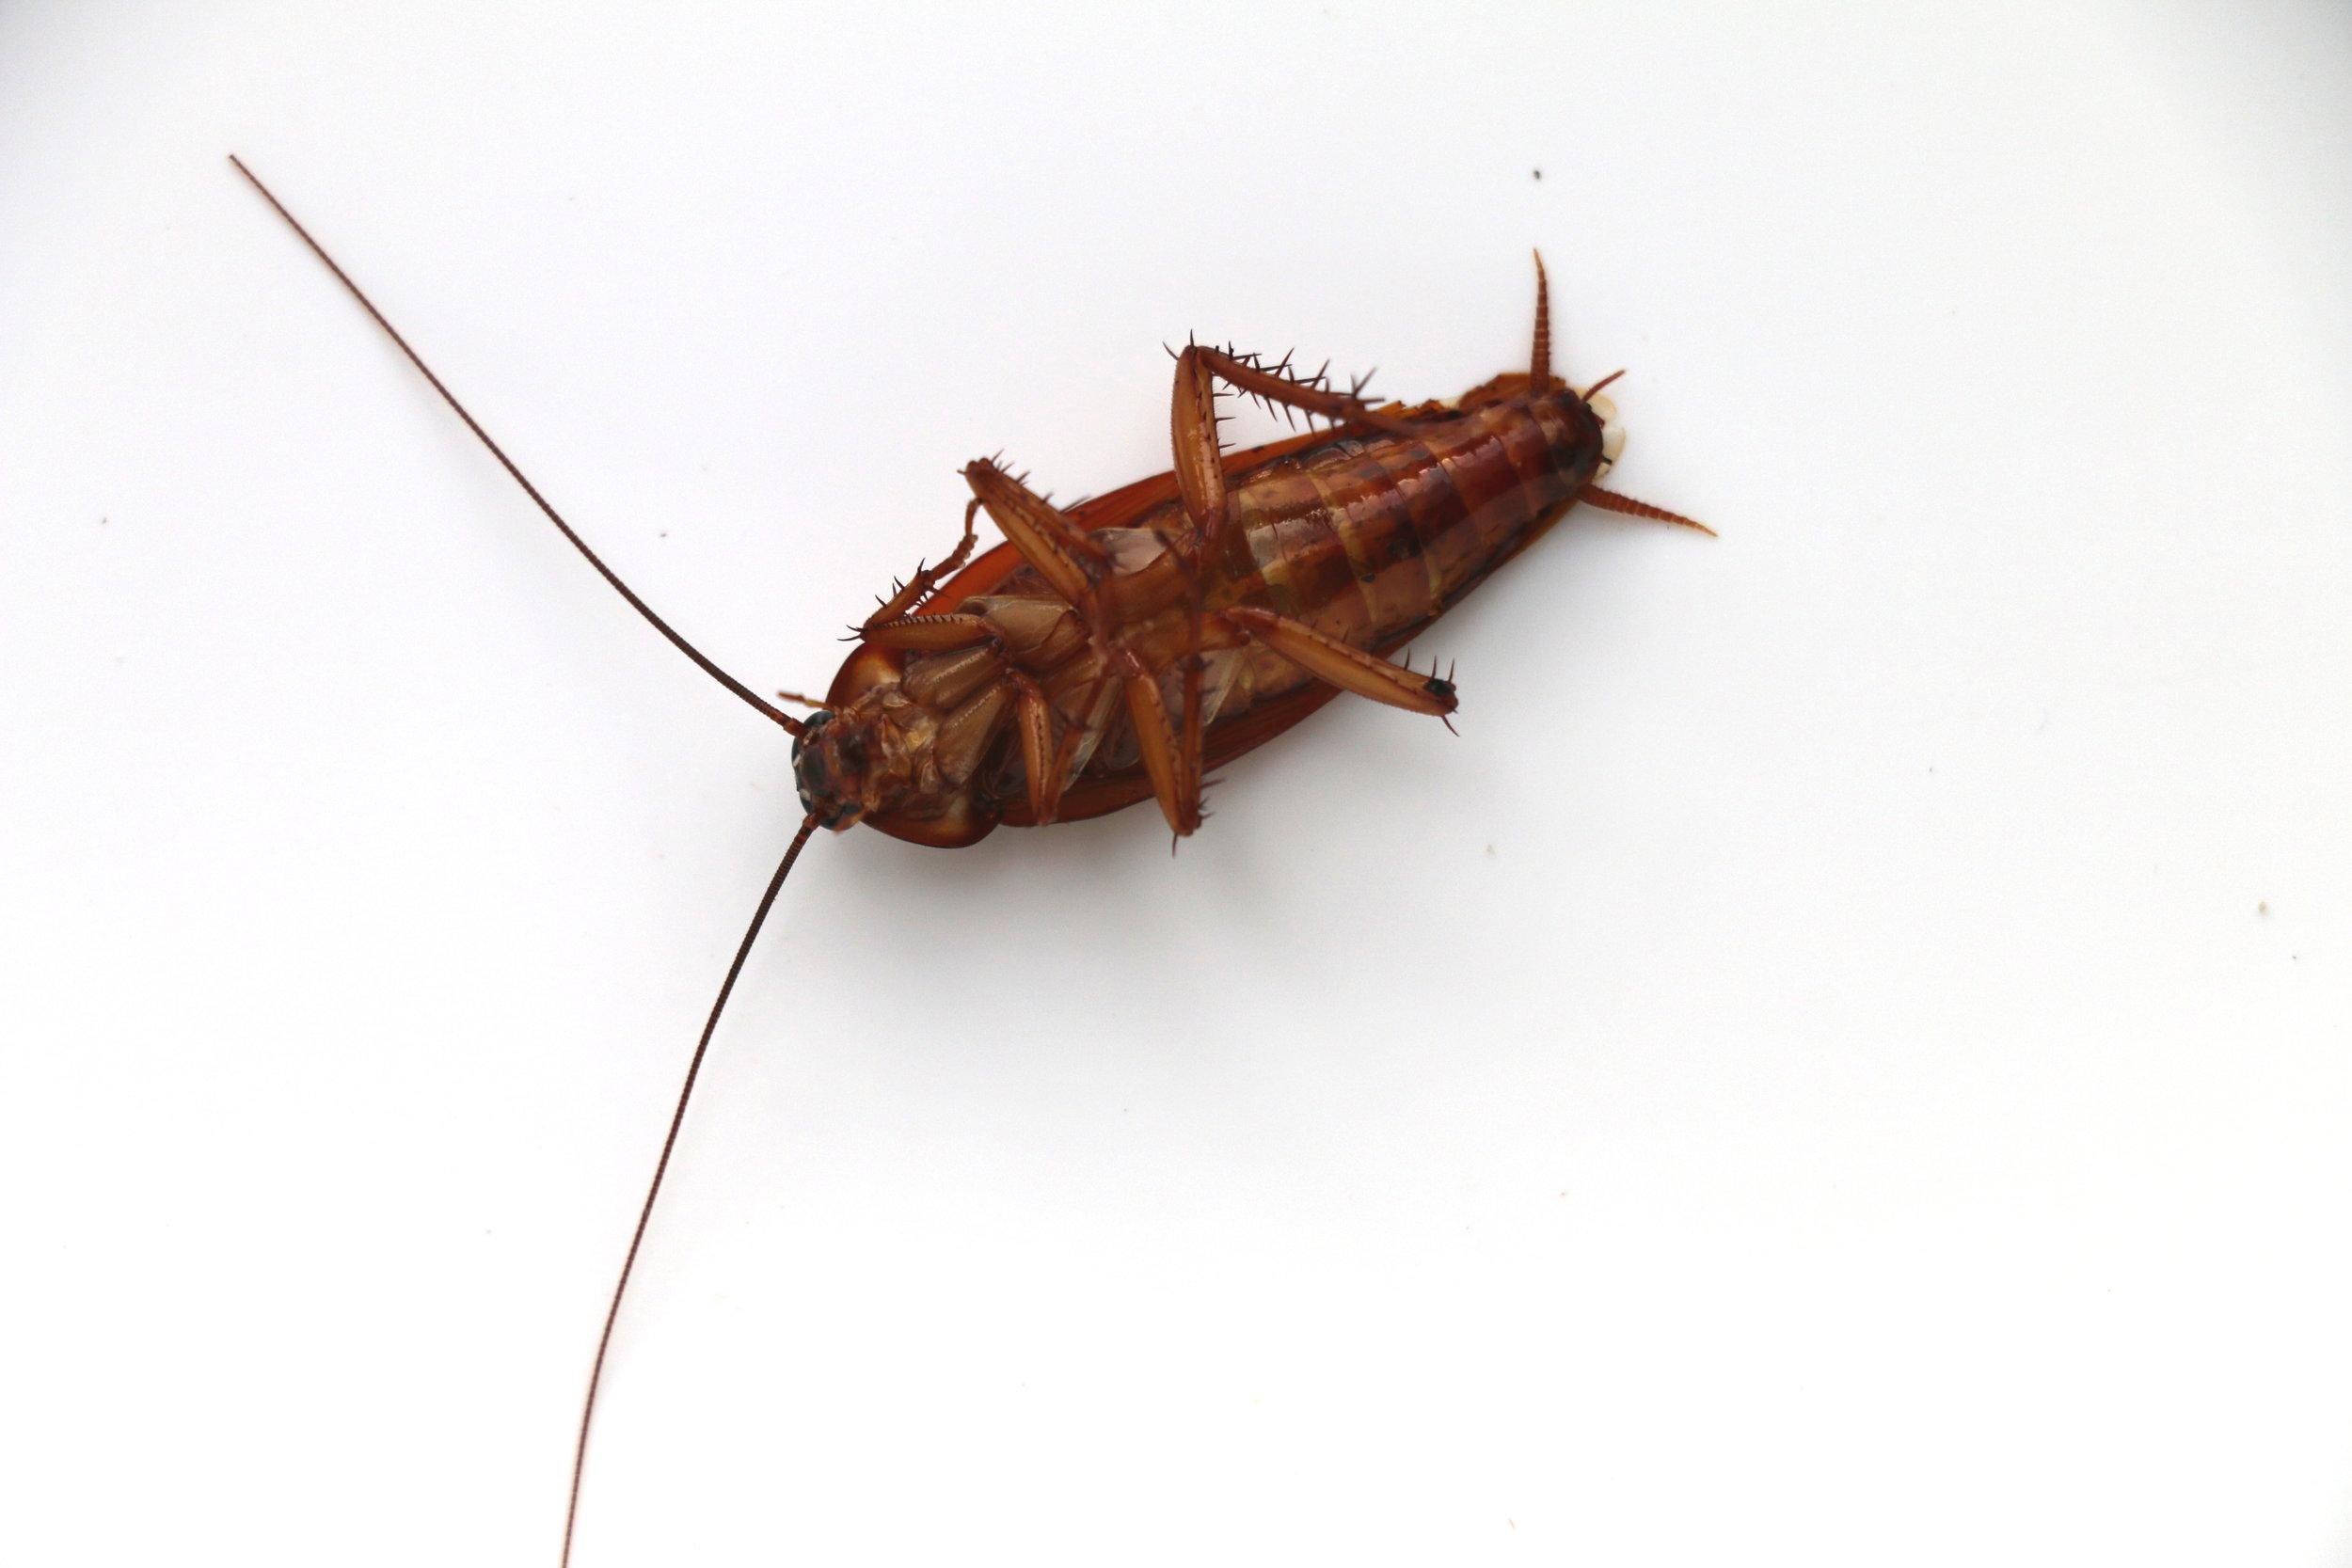 COckroach treatments